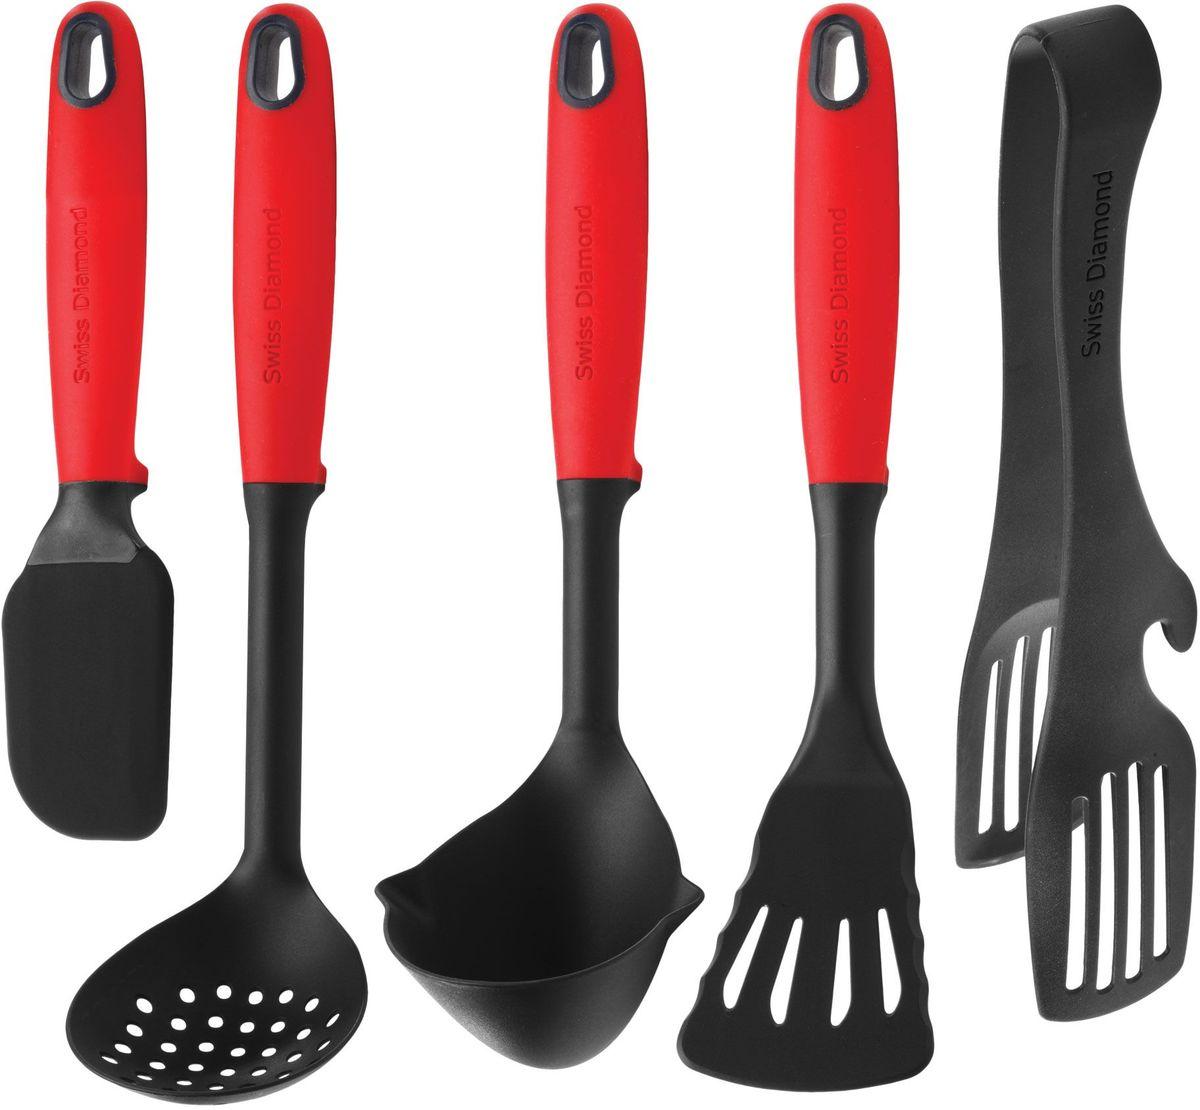 Кухонный набор SDTS02, Силикон, Пластик